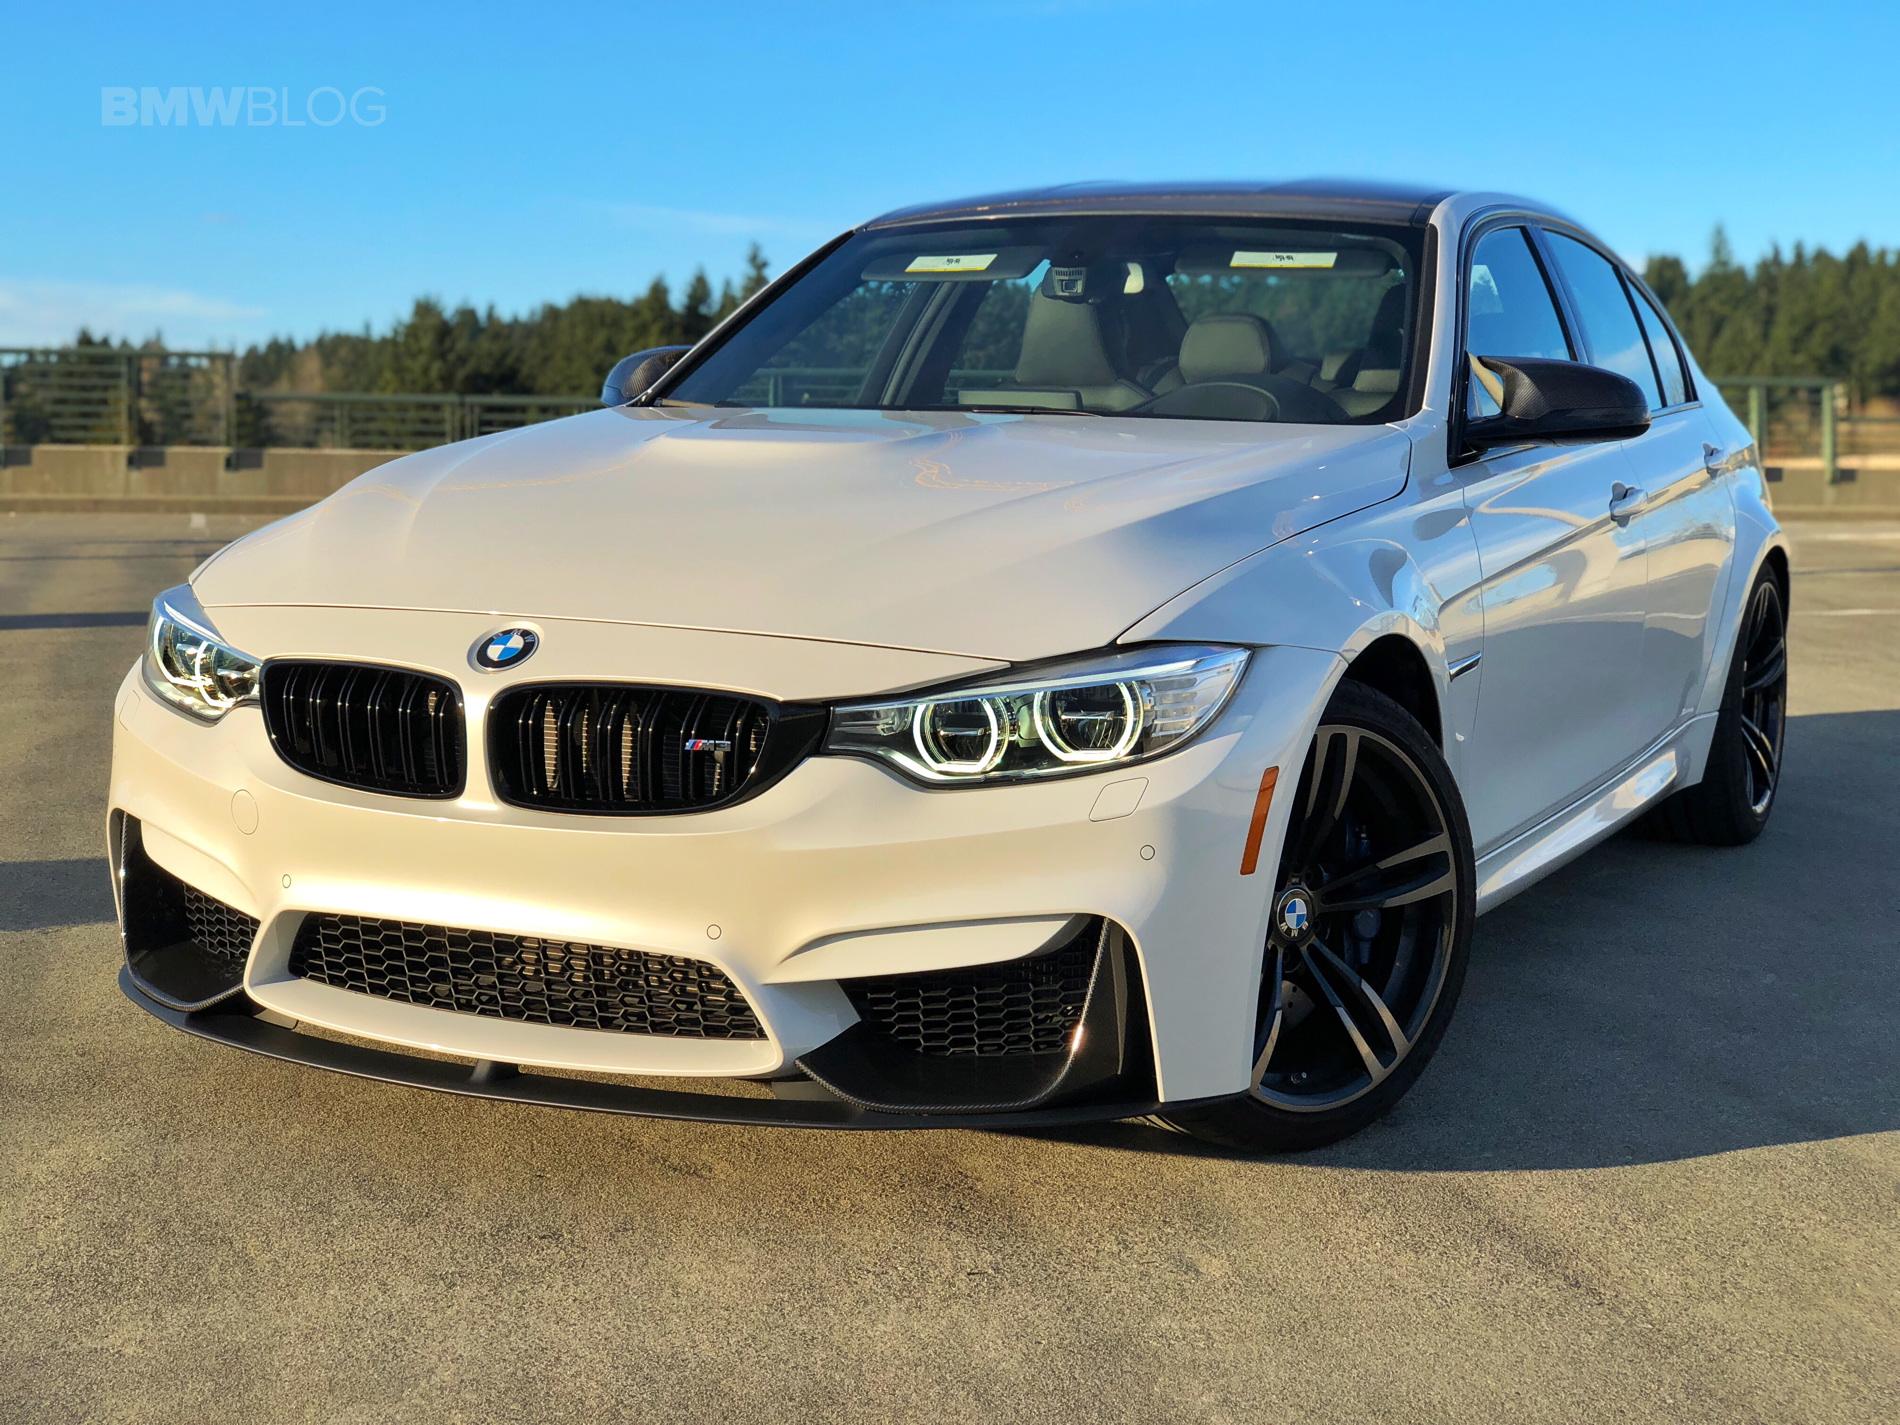 BMW F80 M3 long term review 01